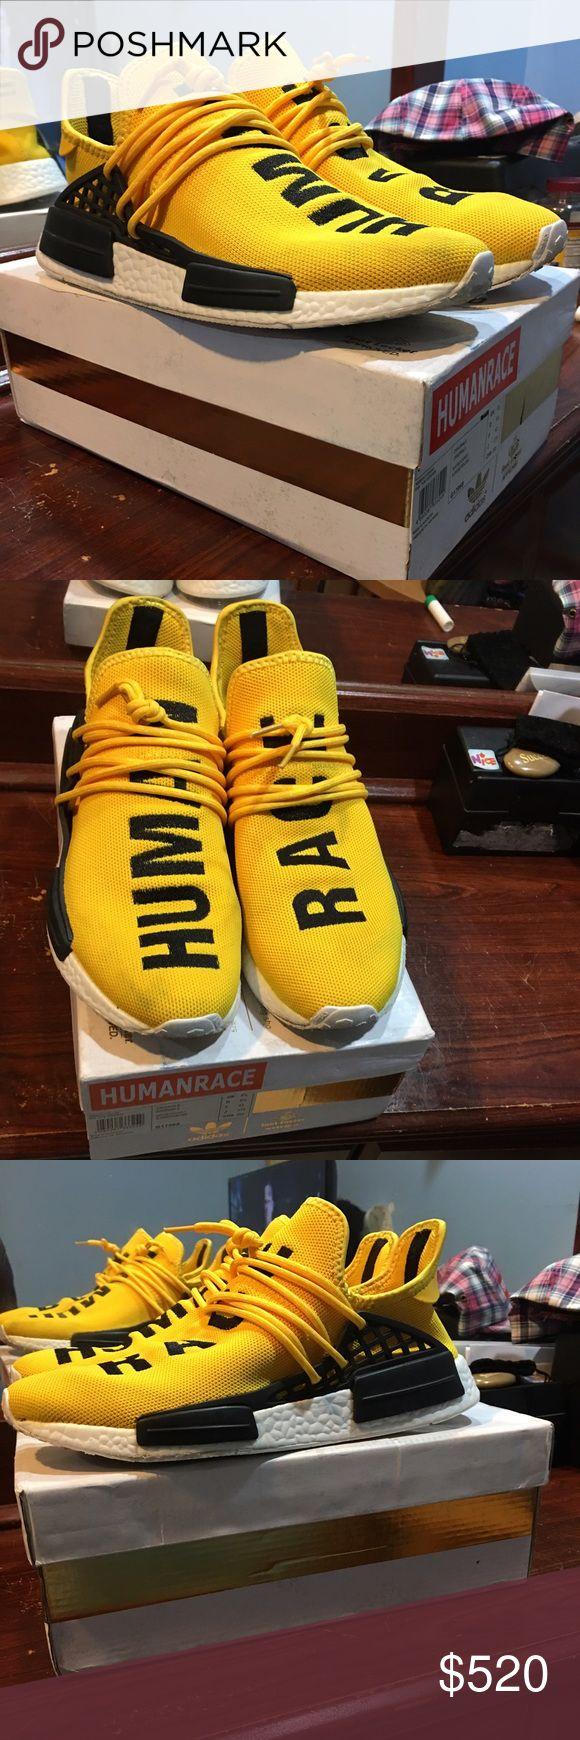 adidas nmd c1 womens yellow